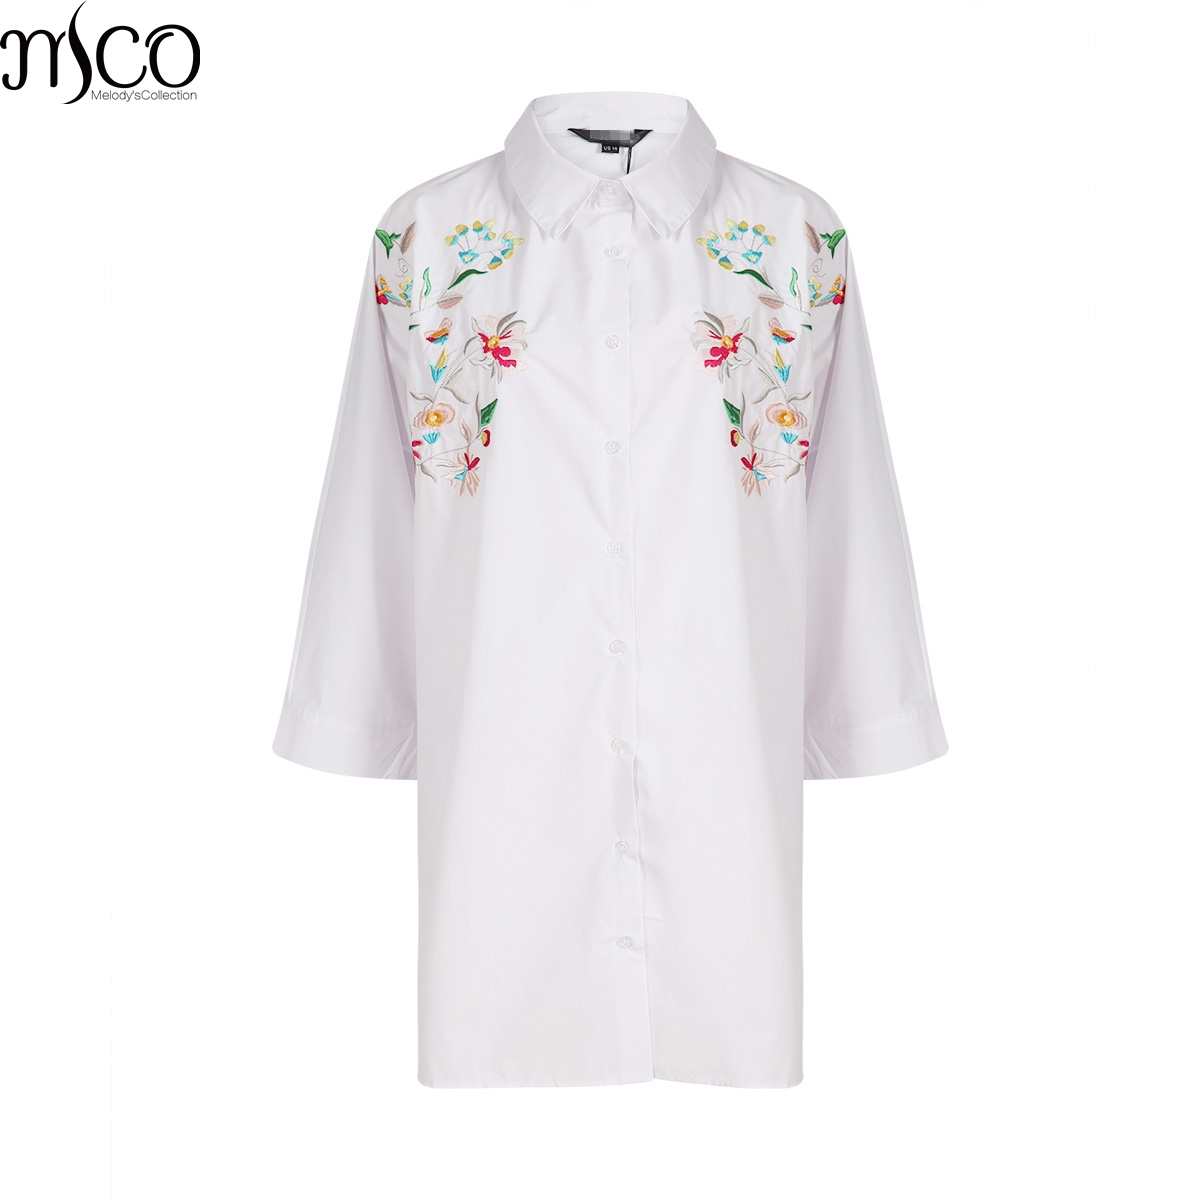 MCO Fashion Floral Emboridered Top Oversized Basic Plus Size Women Clothing Classic Big Kimono Shirt 5xl 6xl 7xl OL Long Blouse